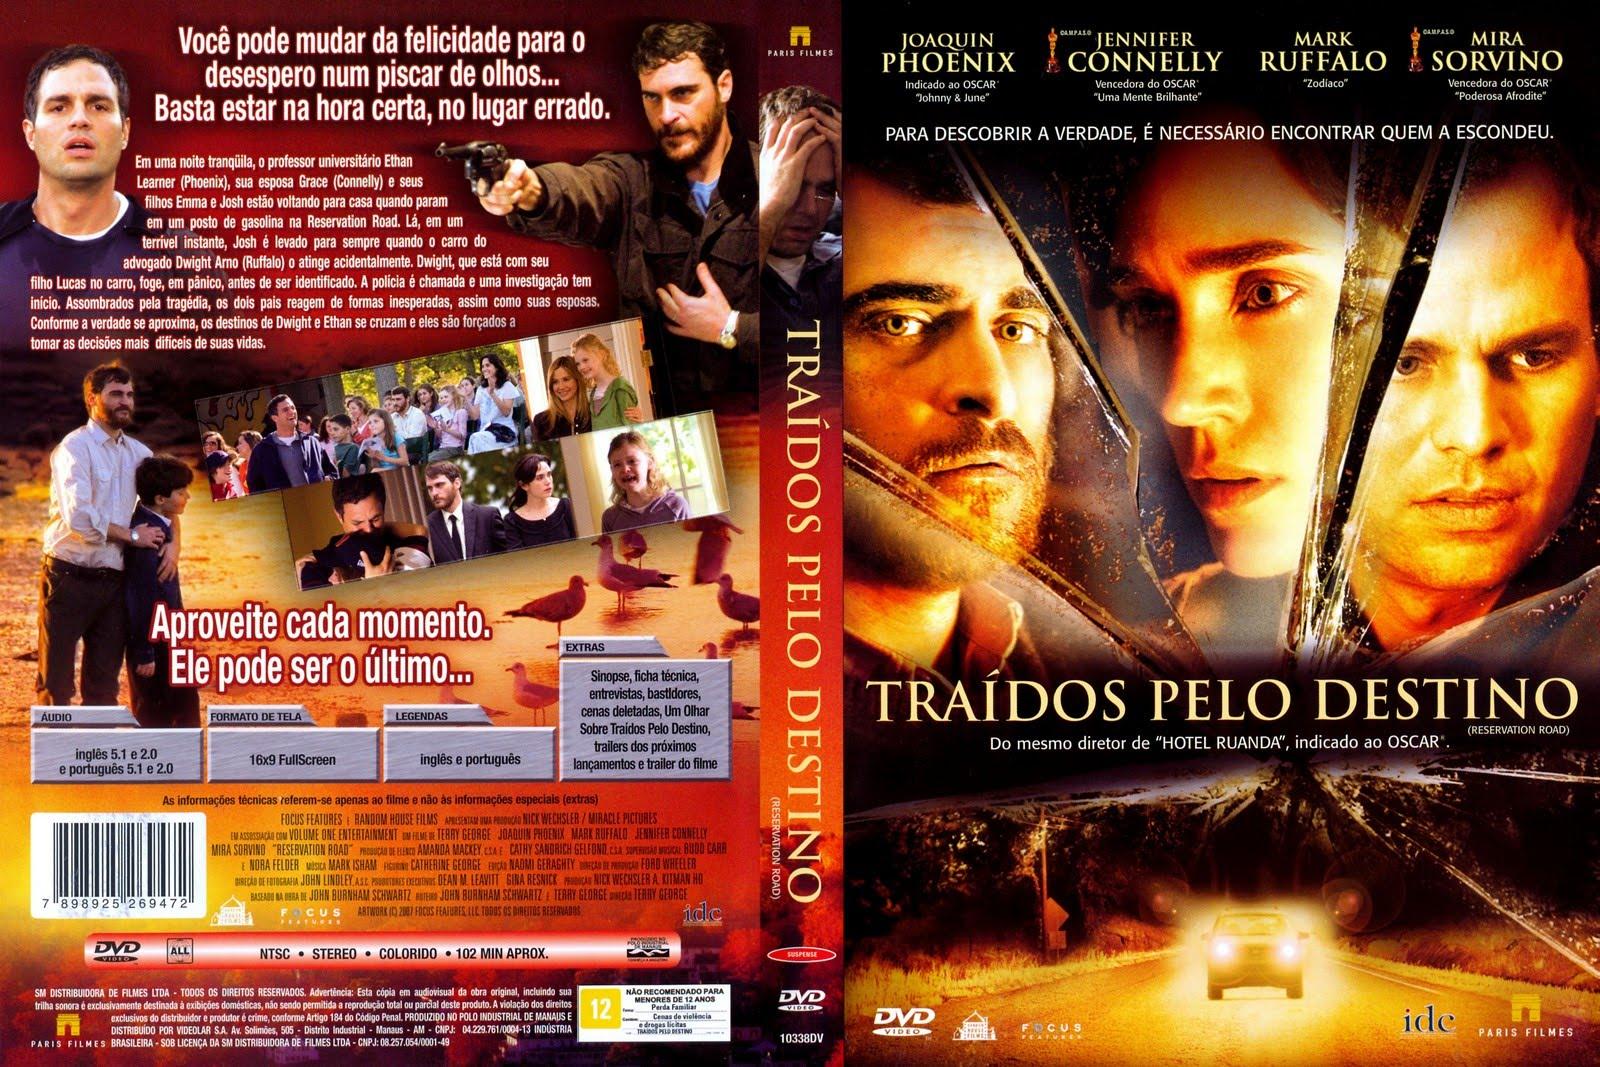 http://3.bp.blogspot.com/_O6SCtKI6wRg/TOlLaGF7y6I/AAAAAAAAAkc/9vF-ATnxbBg/s1600/Traidos+Pelo+Destino.jpg